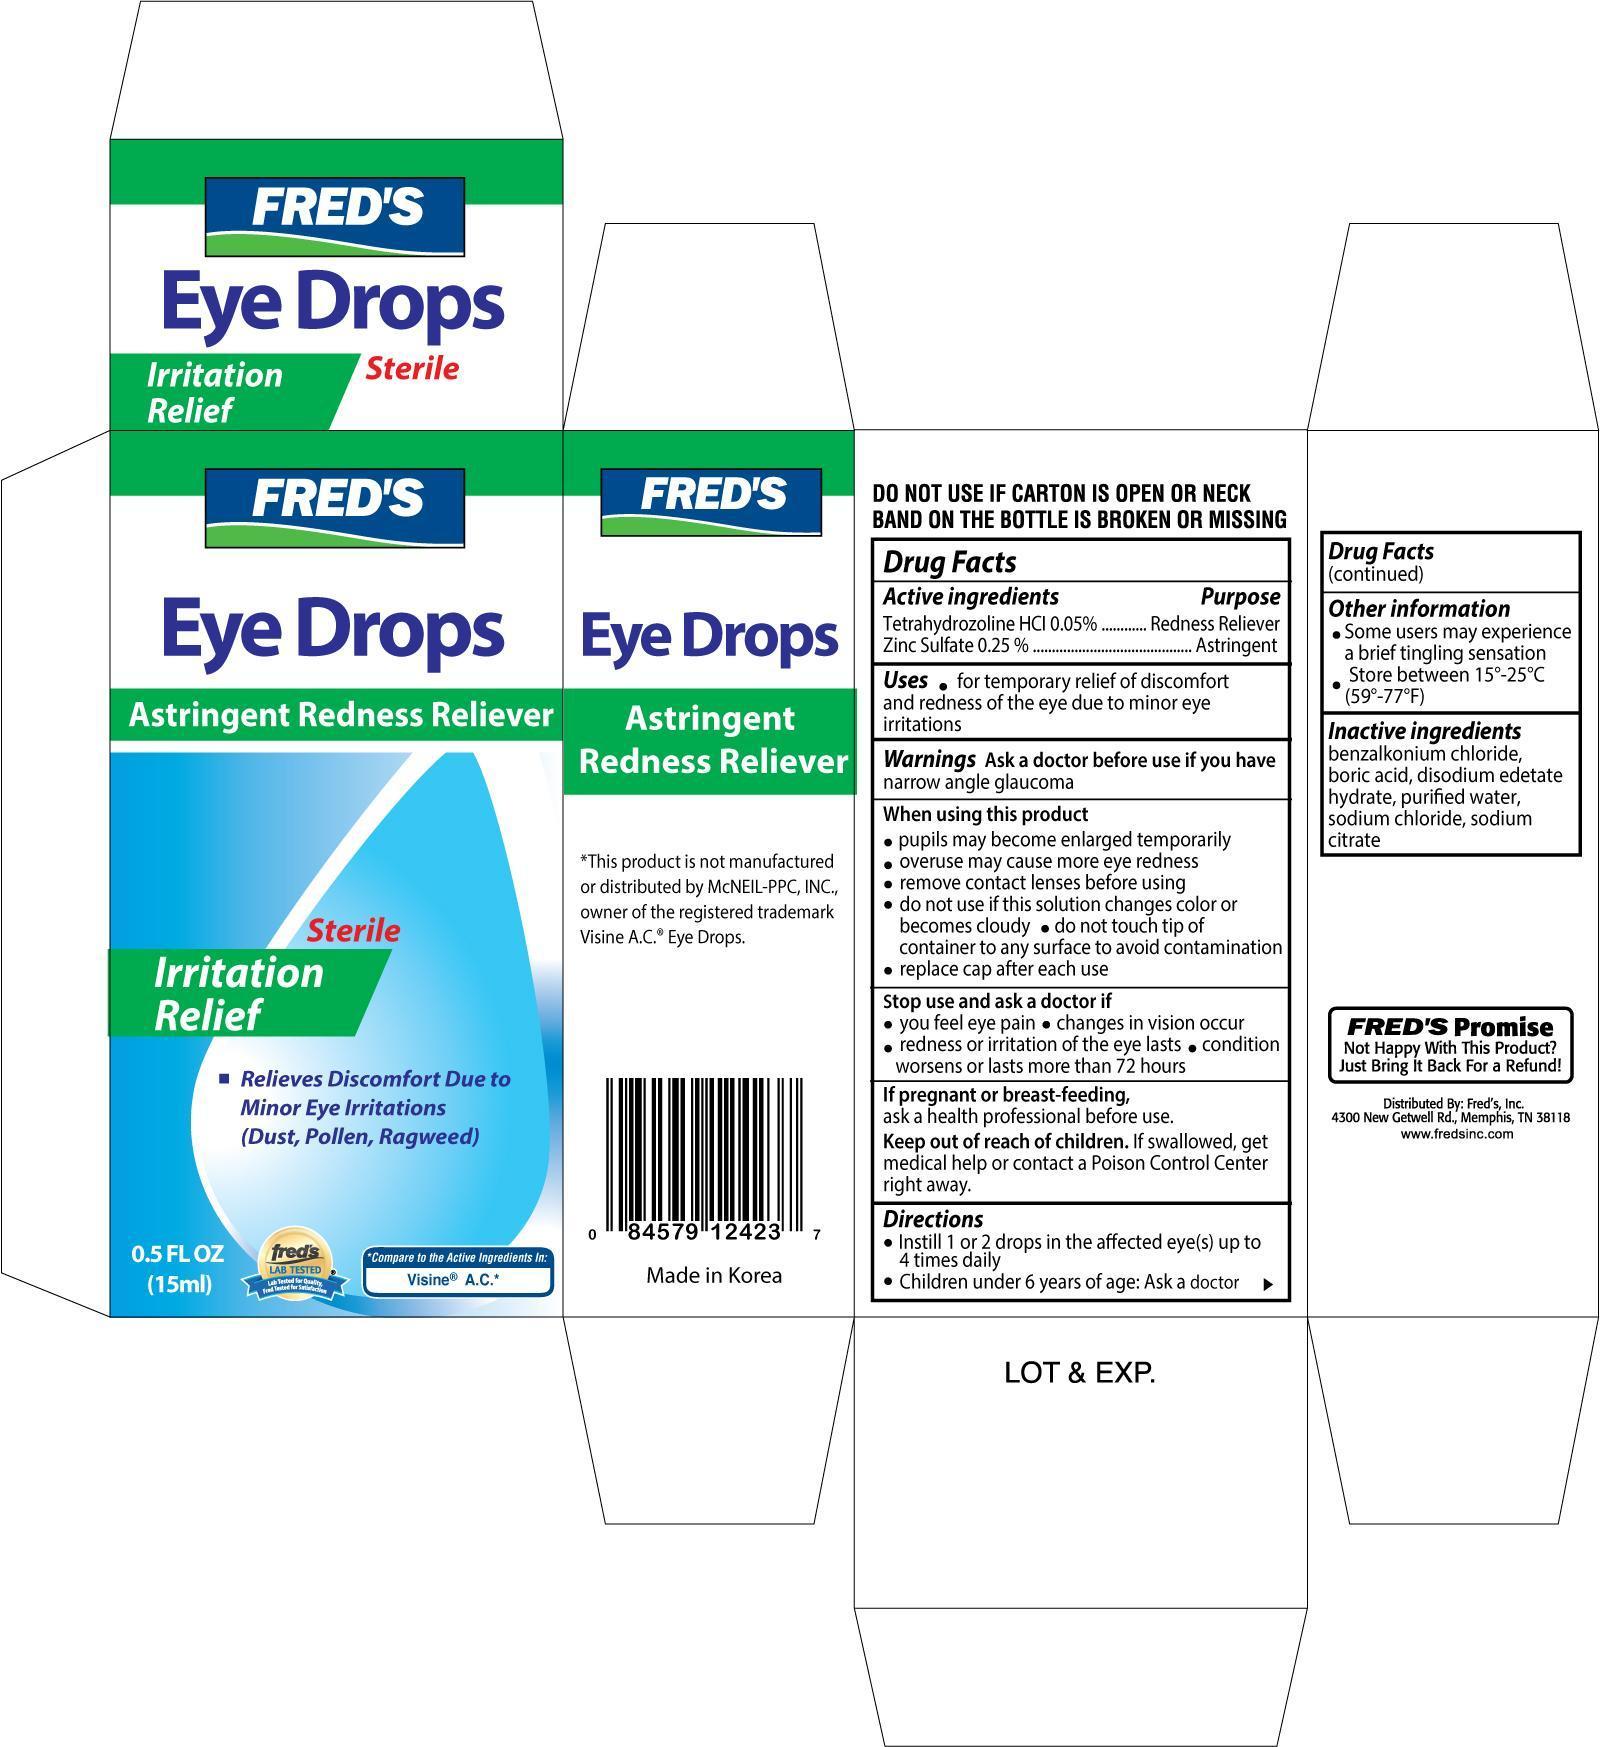 Freds Astringent Rdeness Reliever Eye (Tetrahydrozoline Hydrochloride) Solution [Freds Inc]